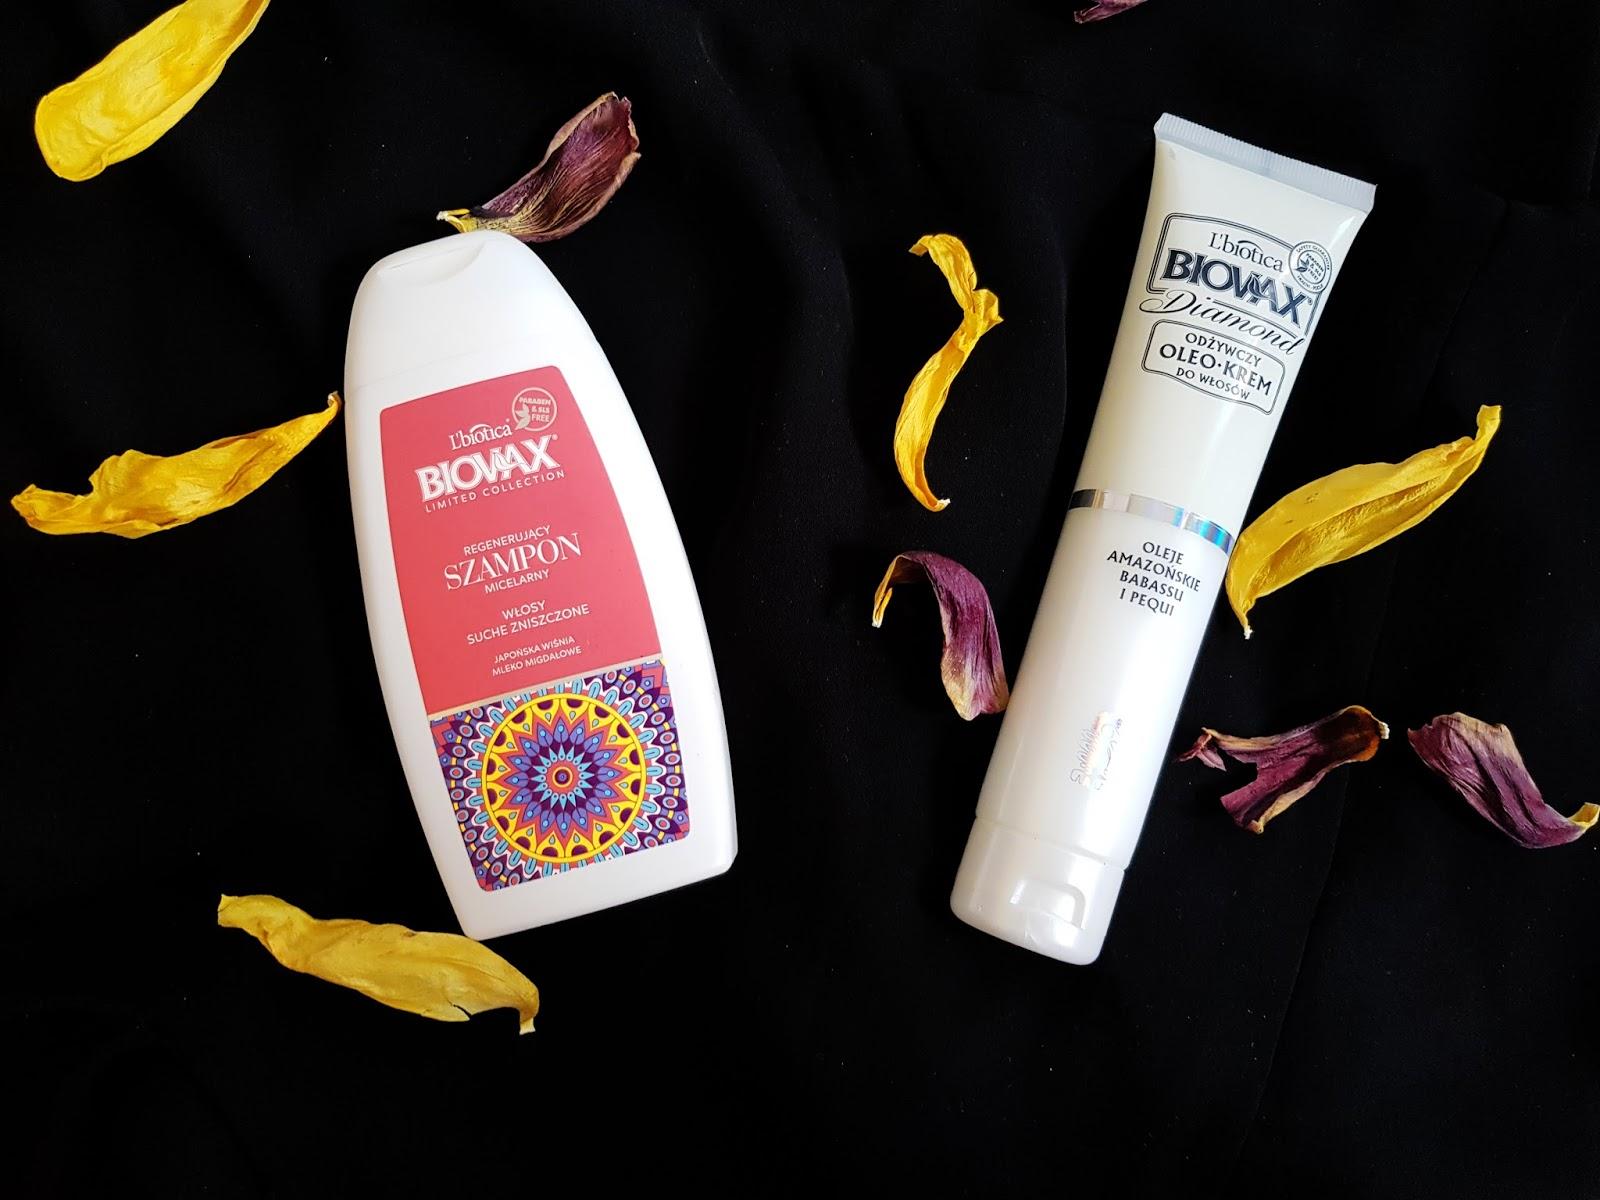 produkty biovax Micealny szampon i Oleo Krem